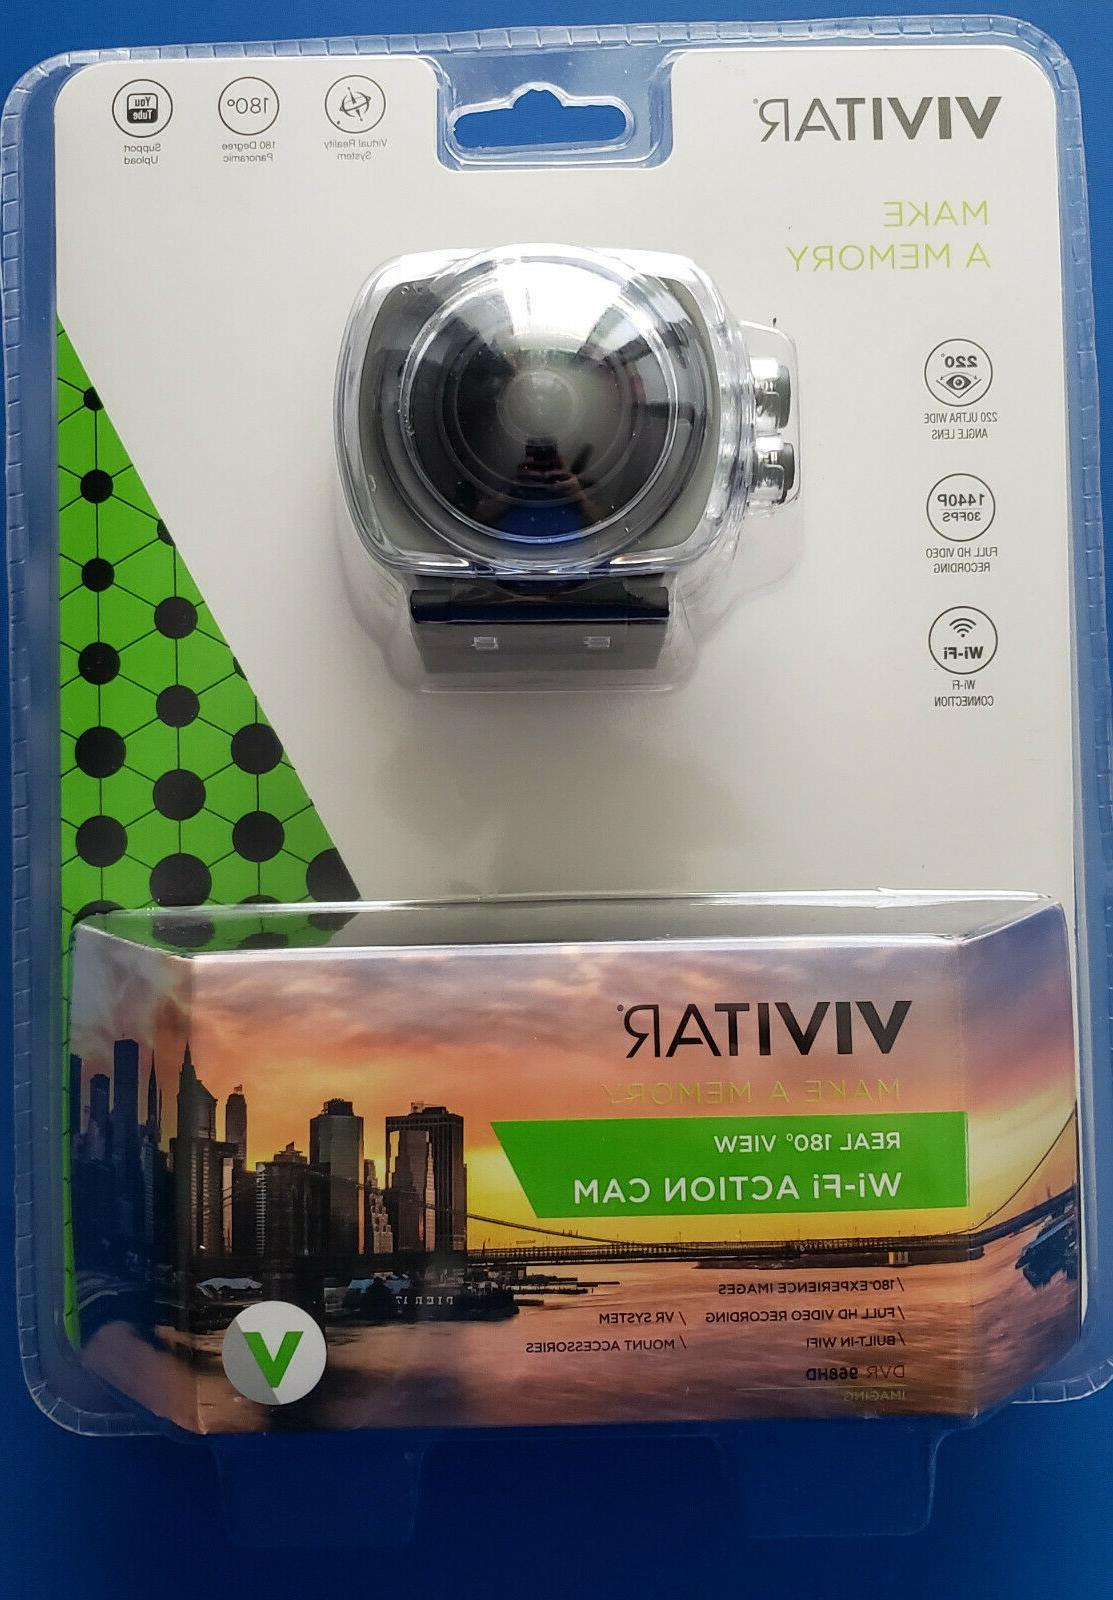 Vivitar 360Cam DVR 968HD 12.1MP Wi-Fi Action Camcorder #DVR9